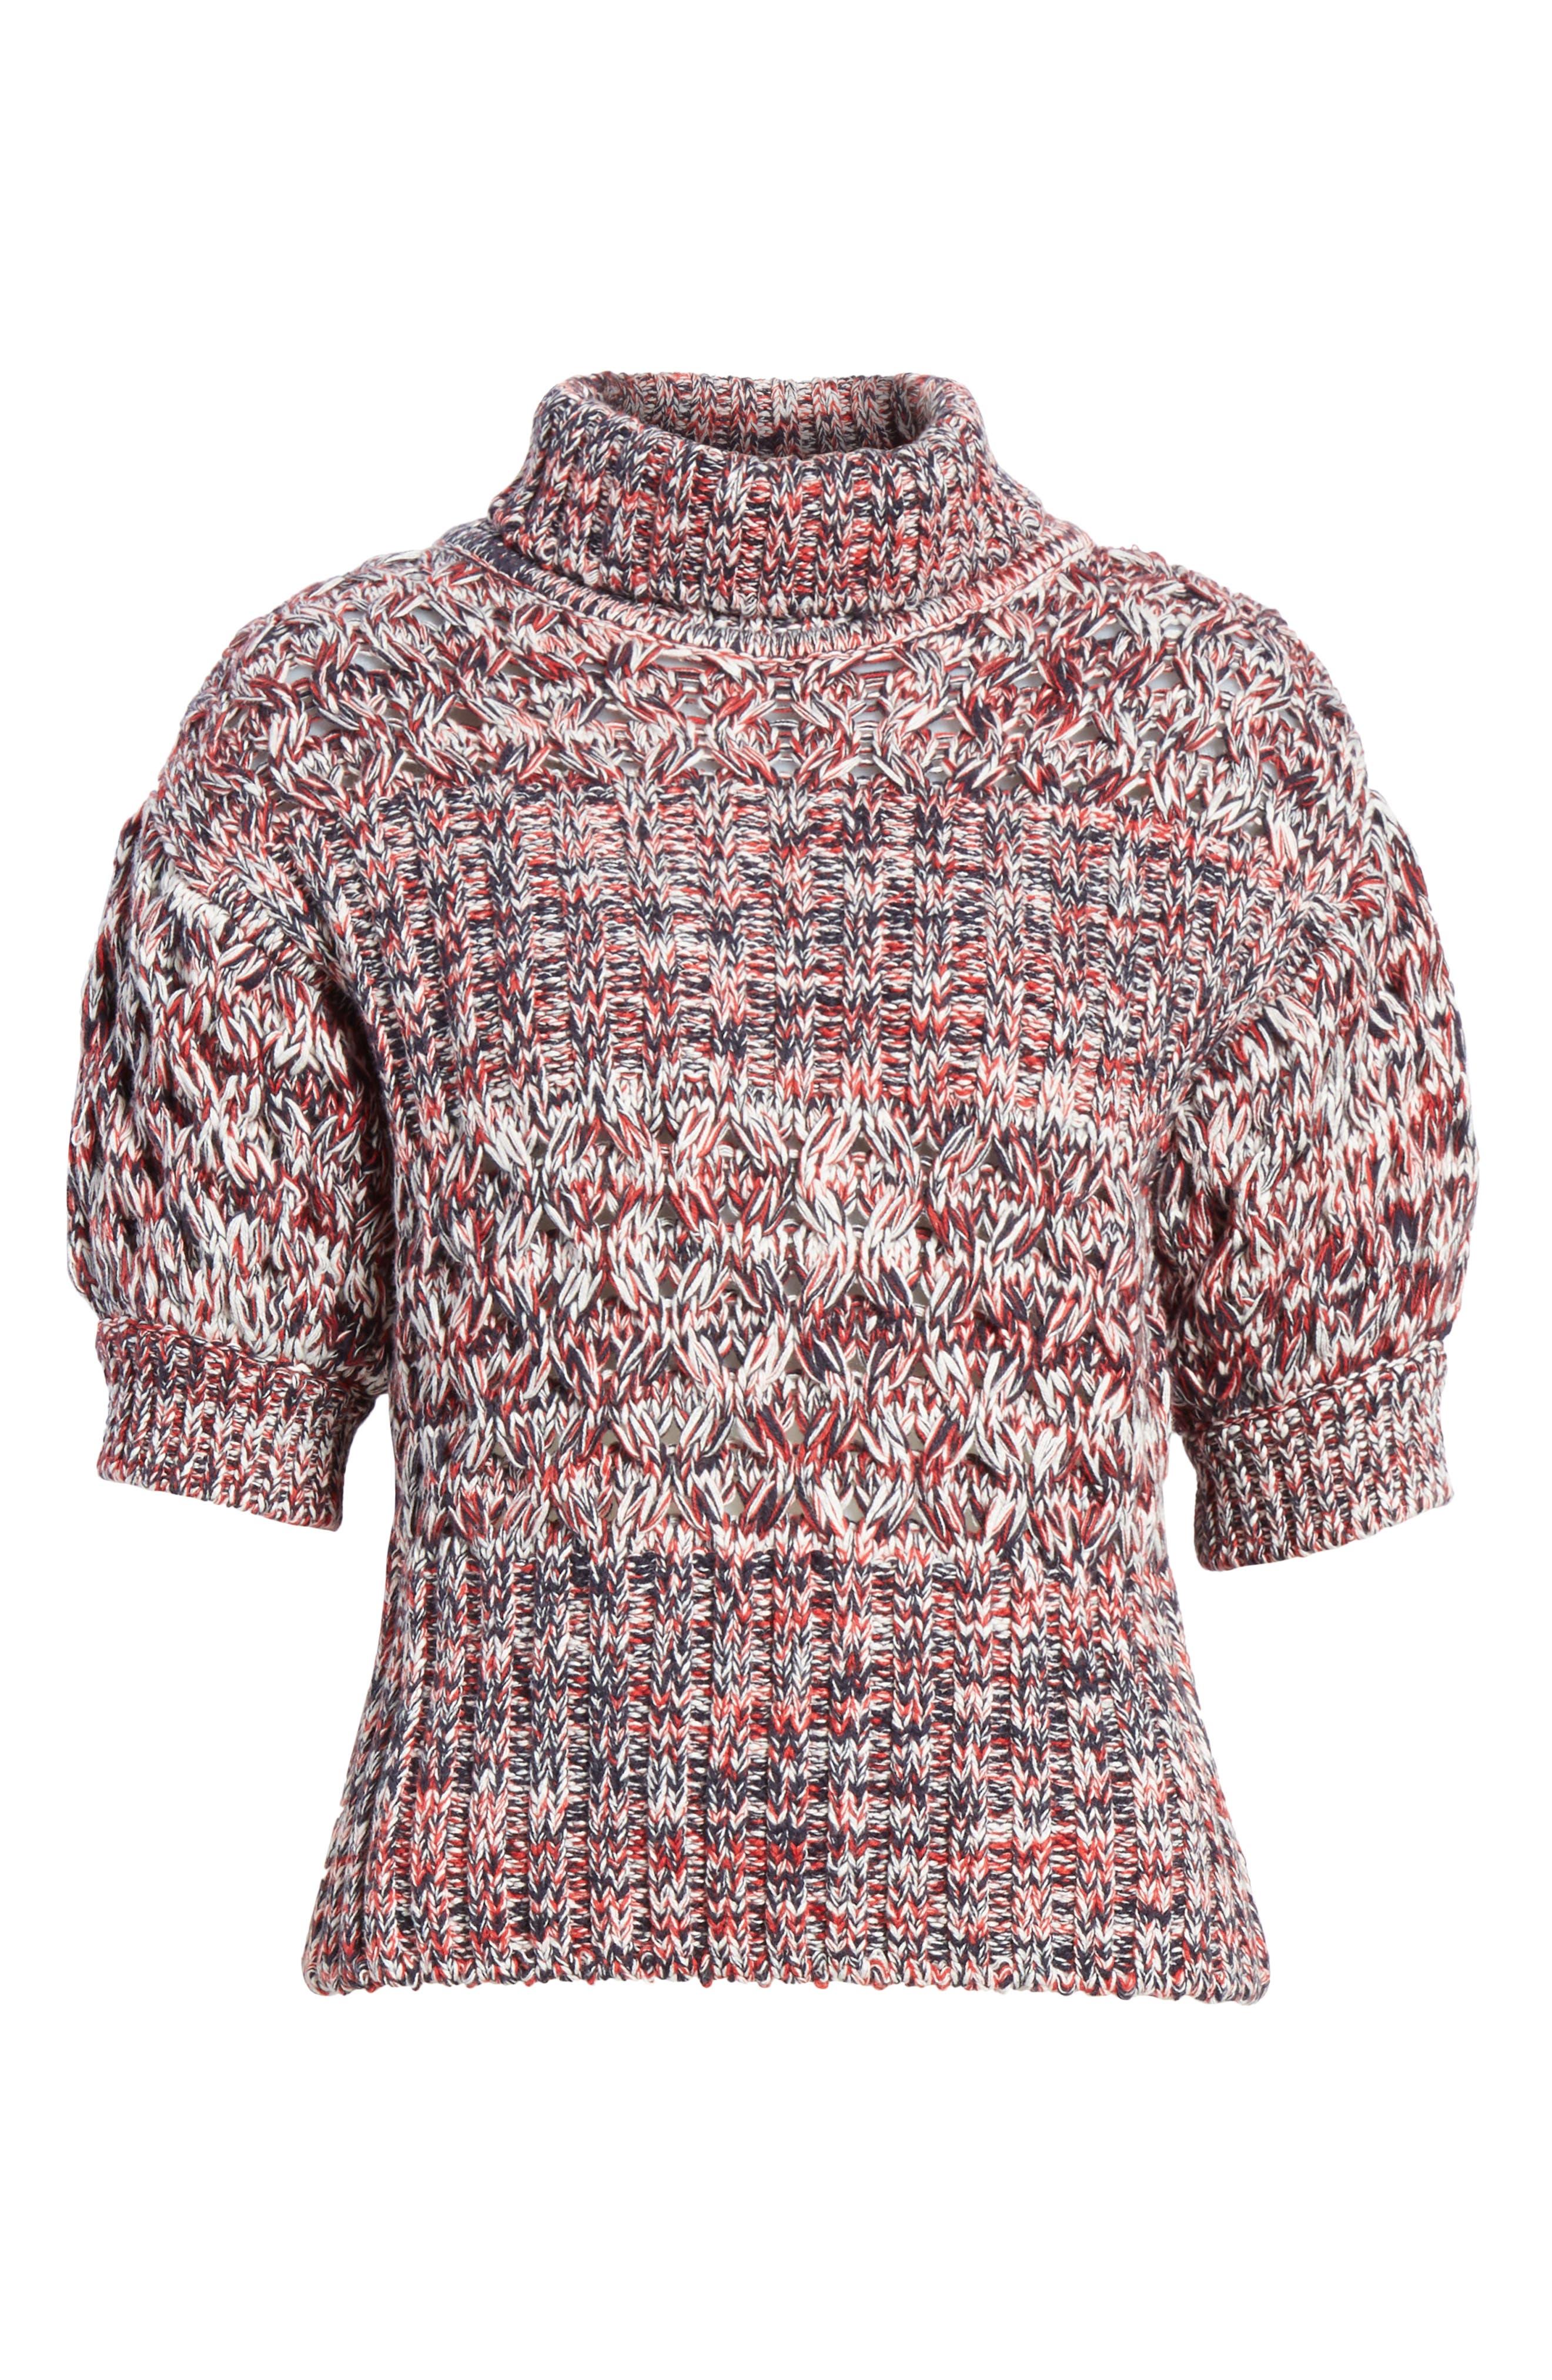 Mélange Cotton & Wool Sweater,                             Alternate thumbnail 6, color,                             600